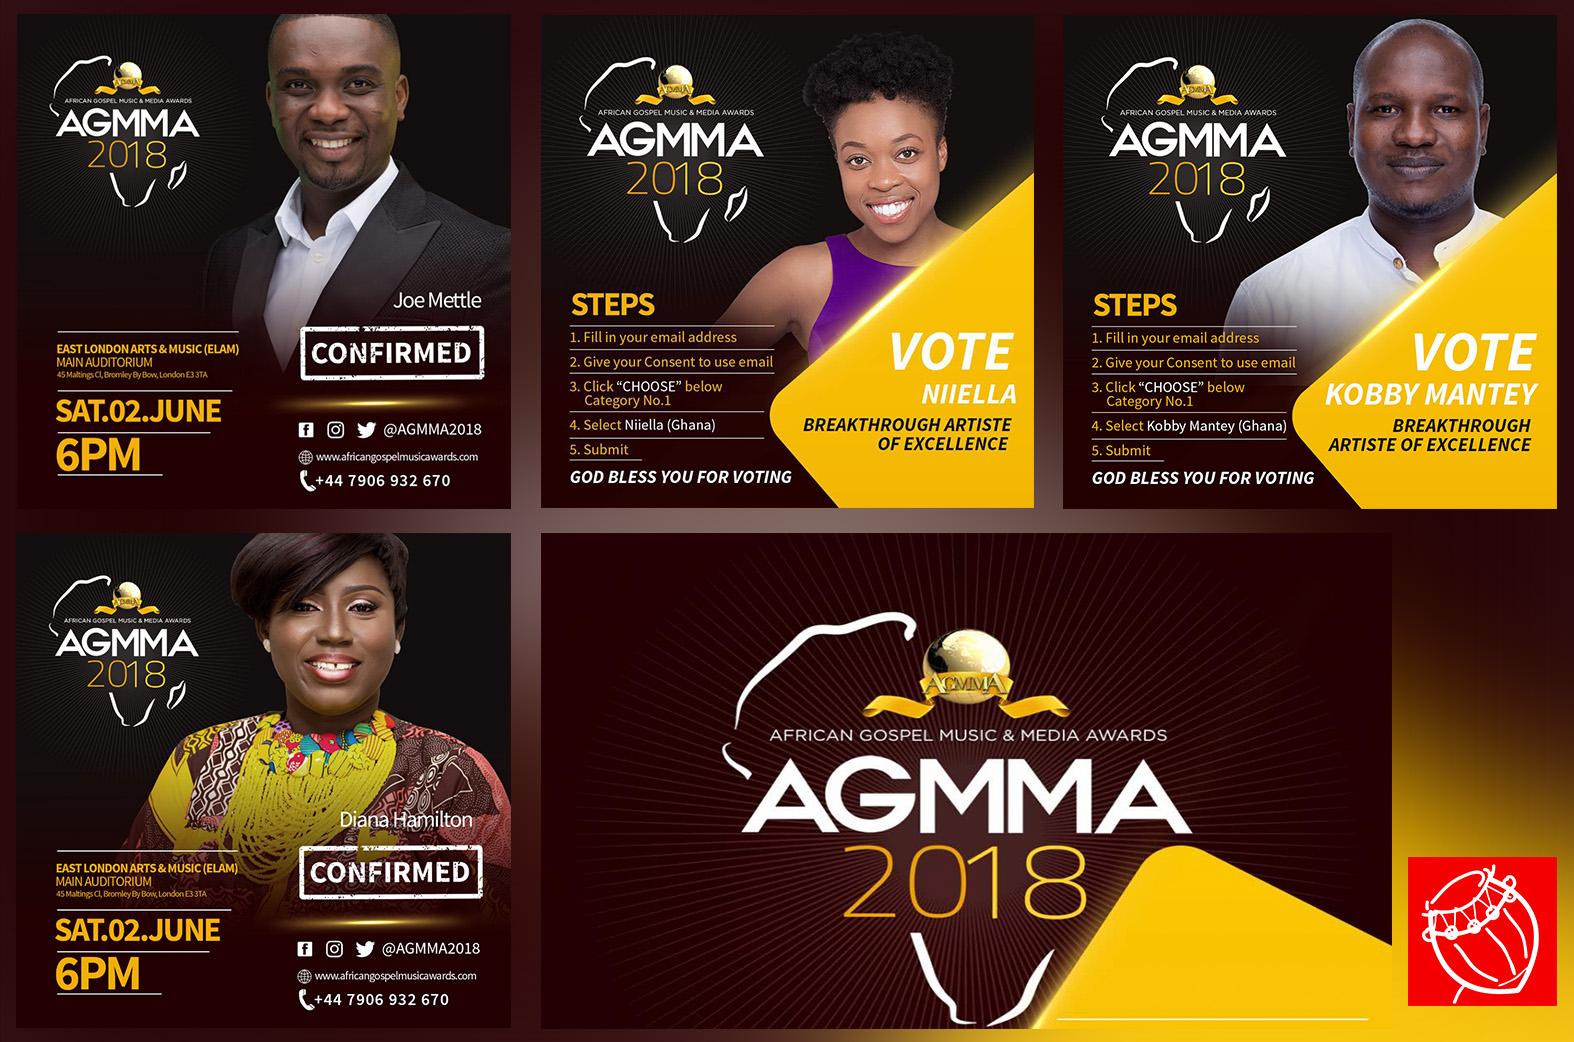 Joe Mettle, Niiella & more nominated for AGMMA 2018